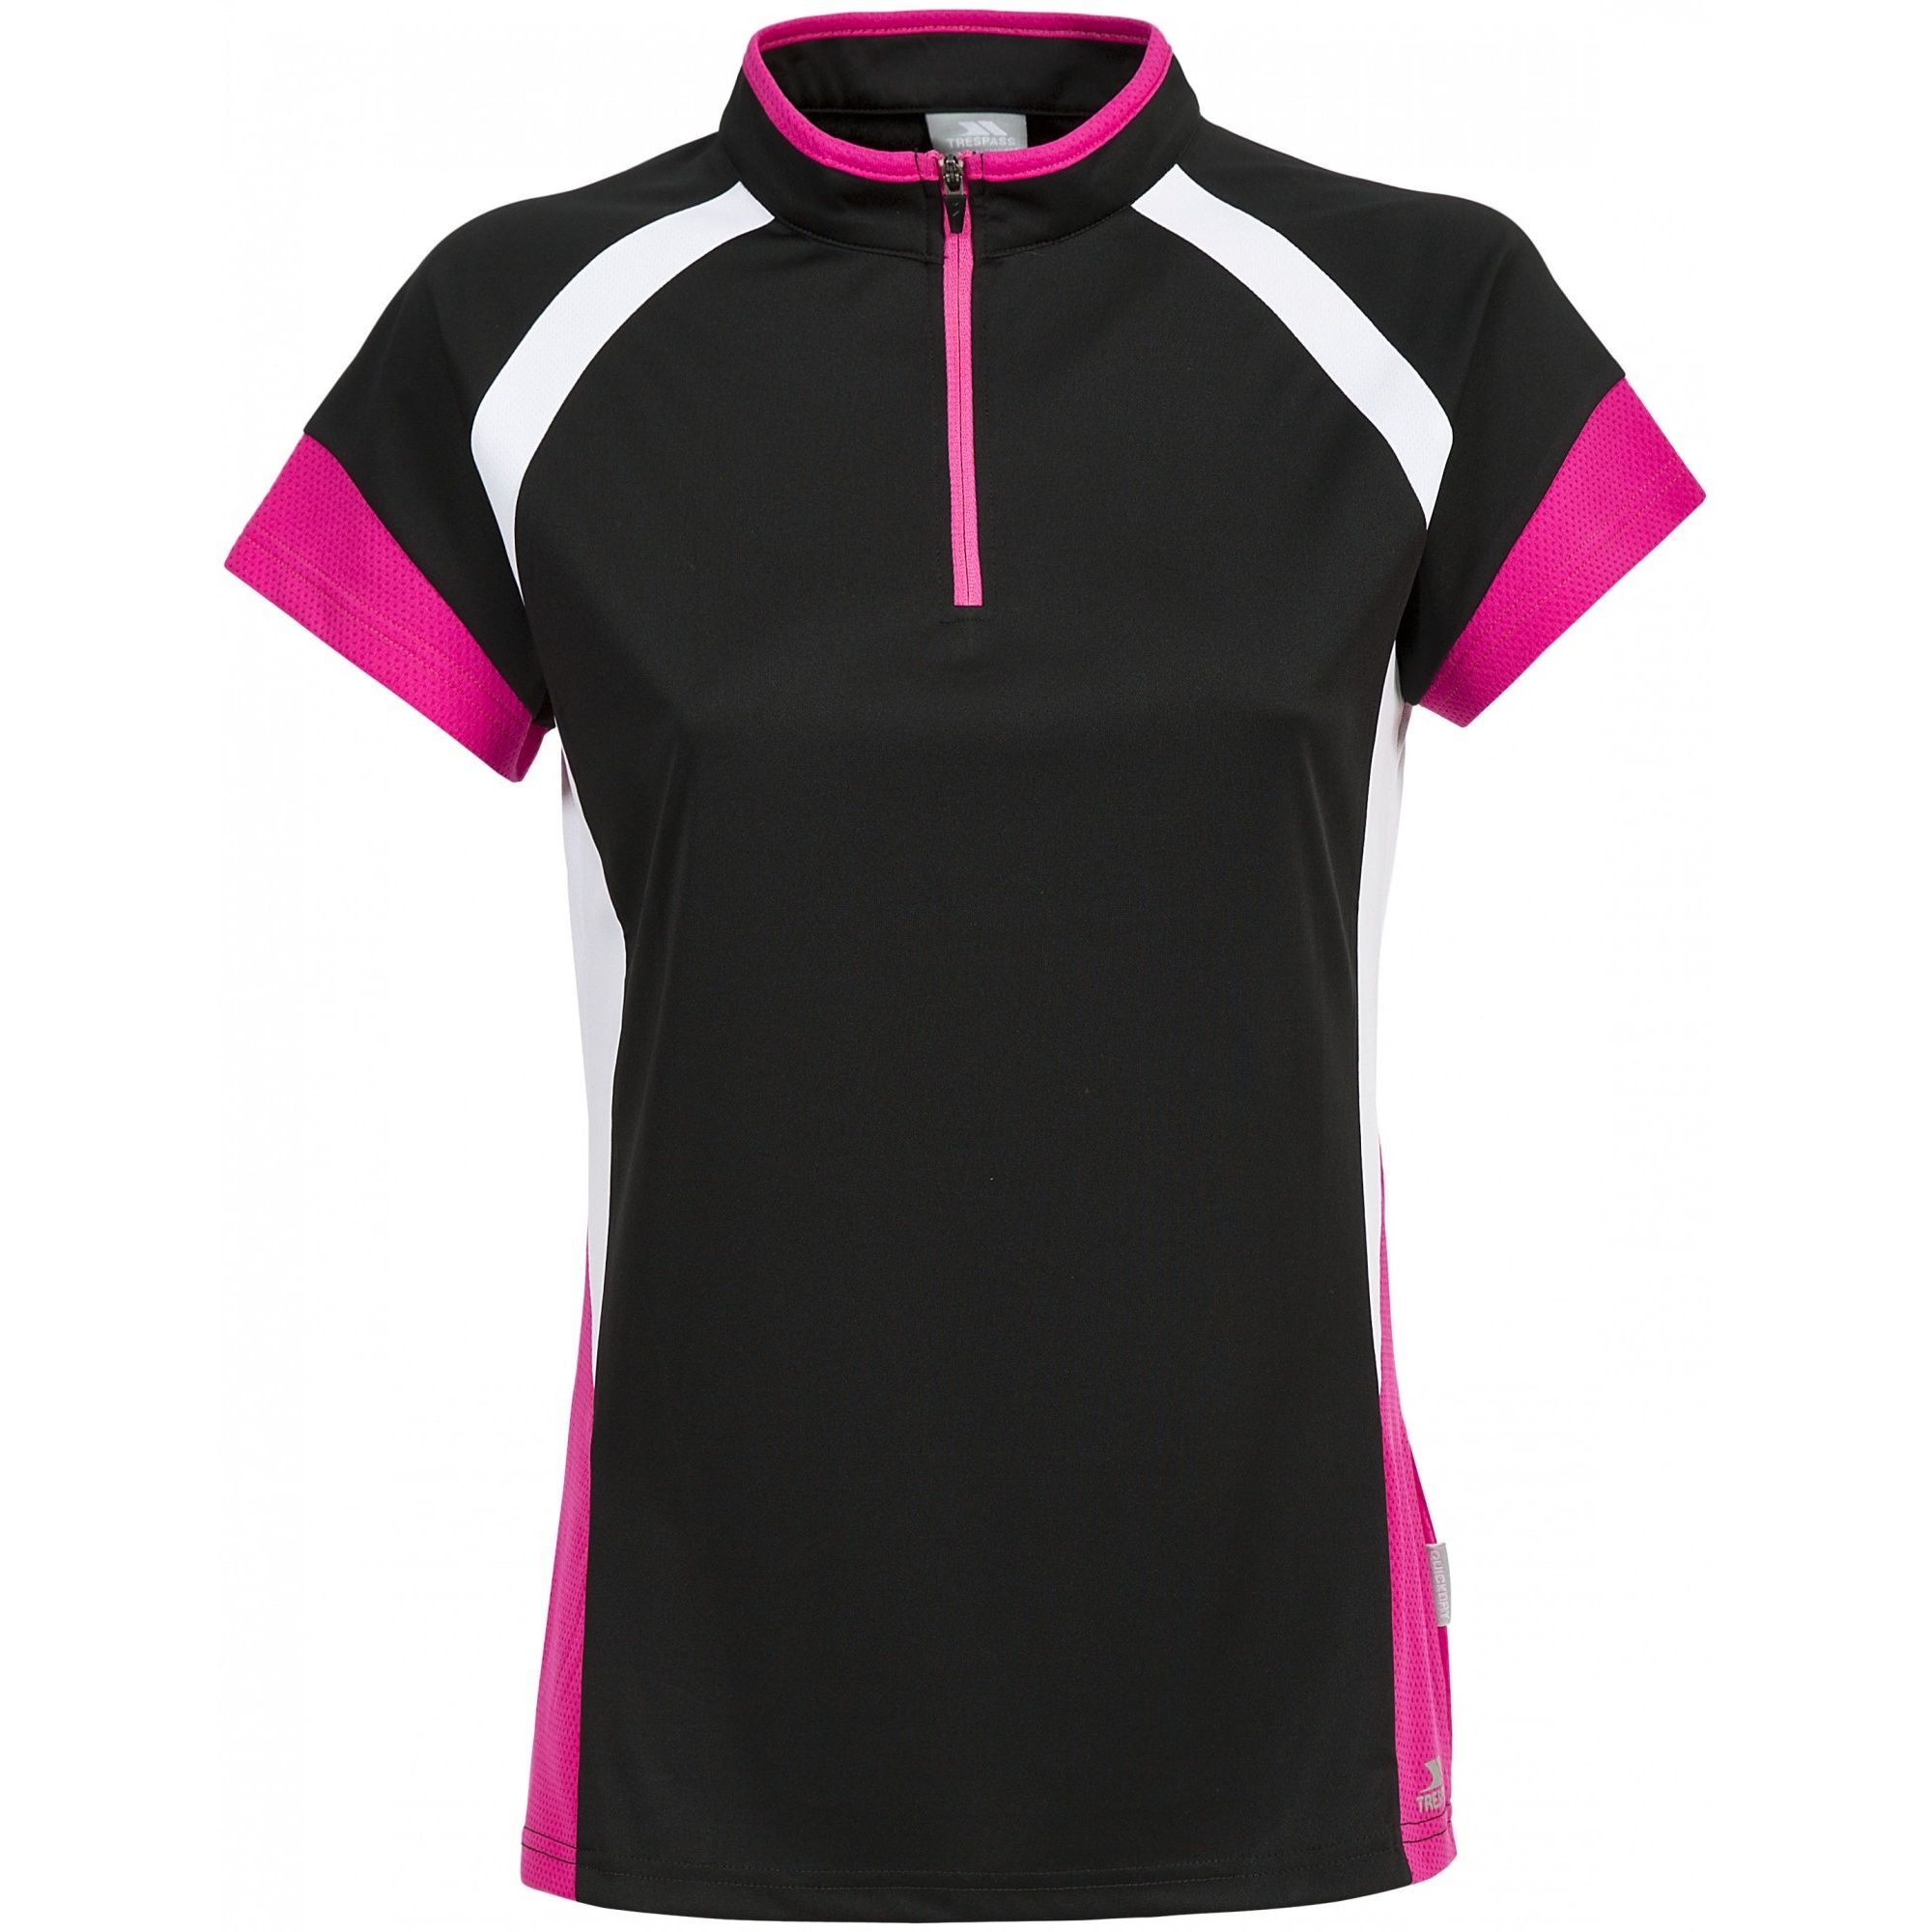 Trespass Womens/Ladies Harpa Short Sleeve Cycling Top